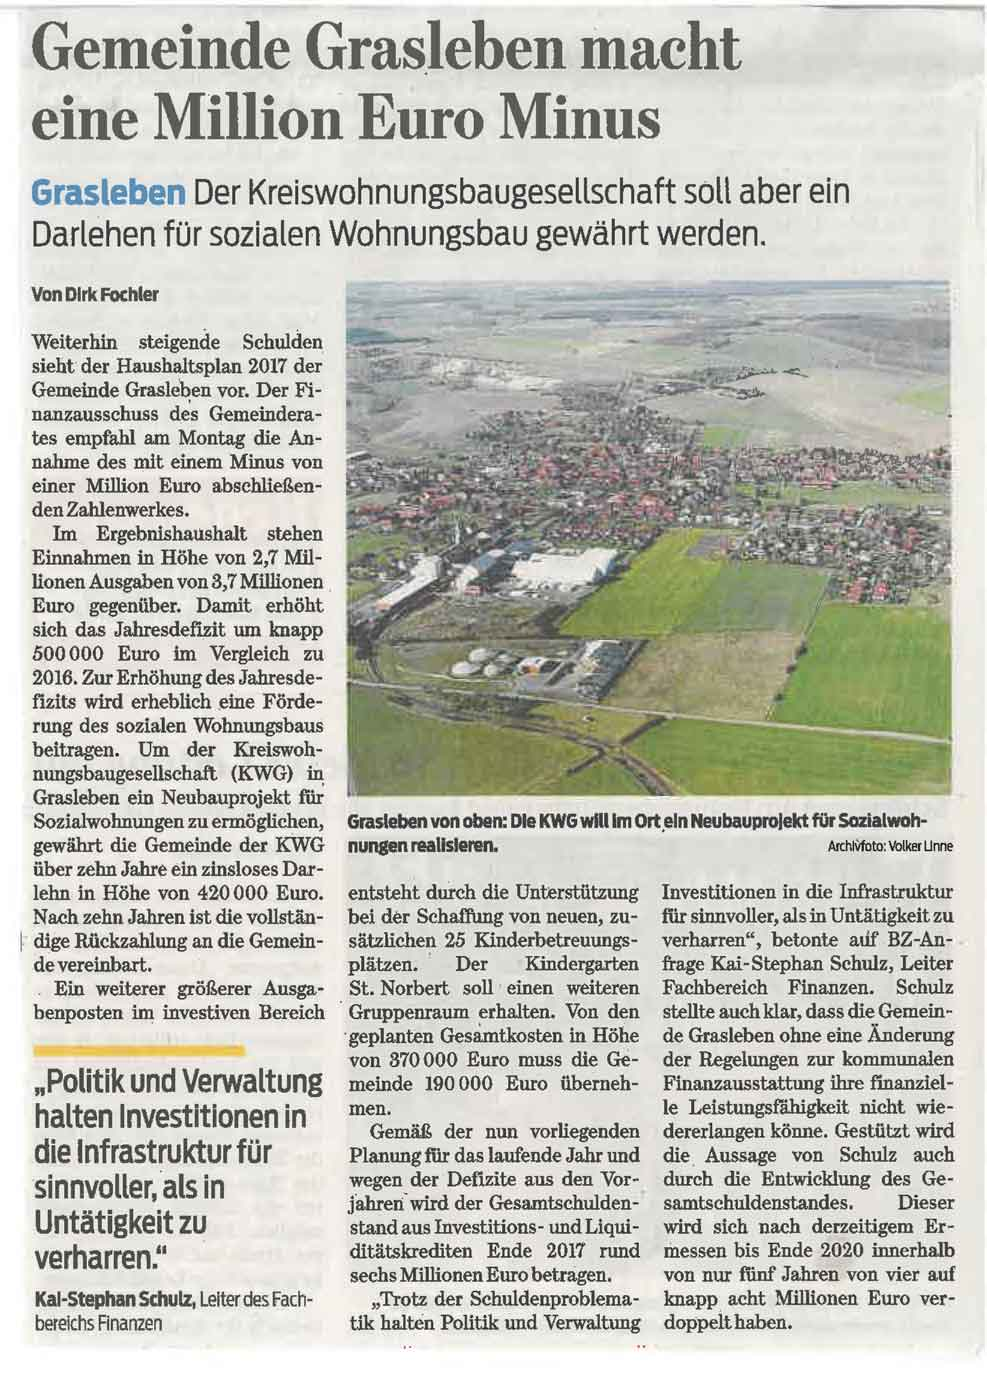 http://www.kwg-helmstedt.de/media/GRASLEBEN_2017-002.jpg